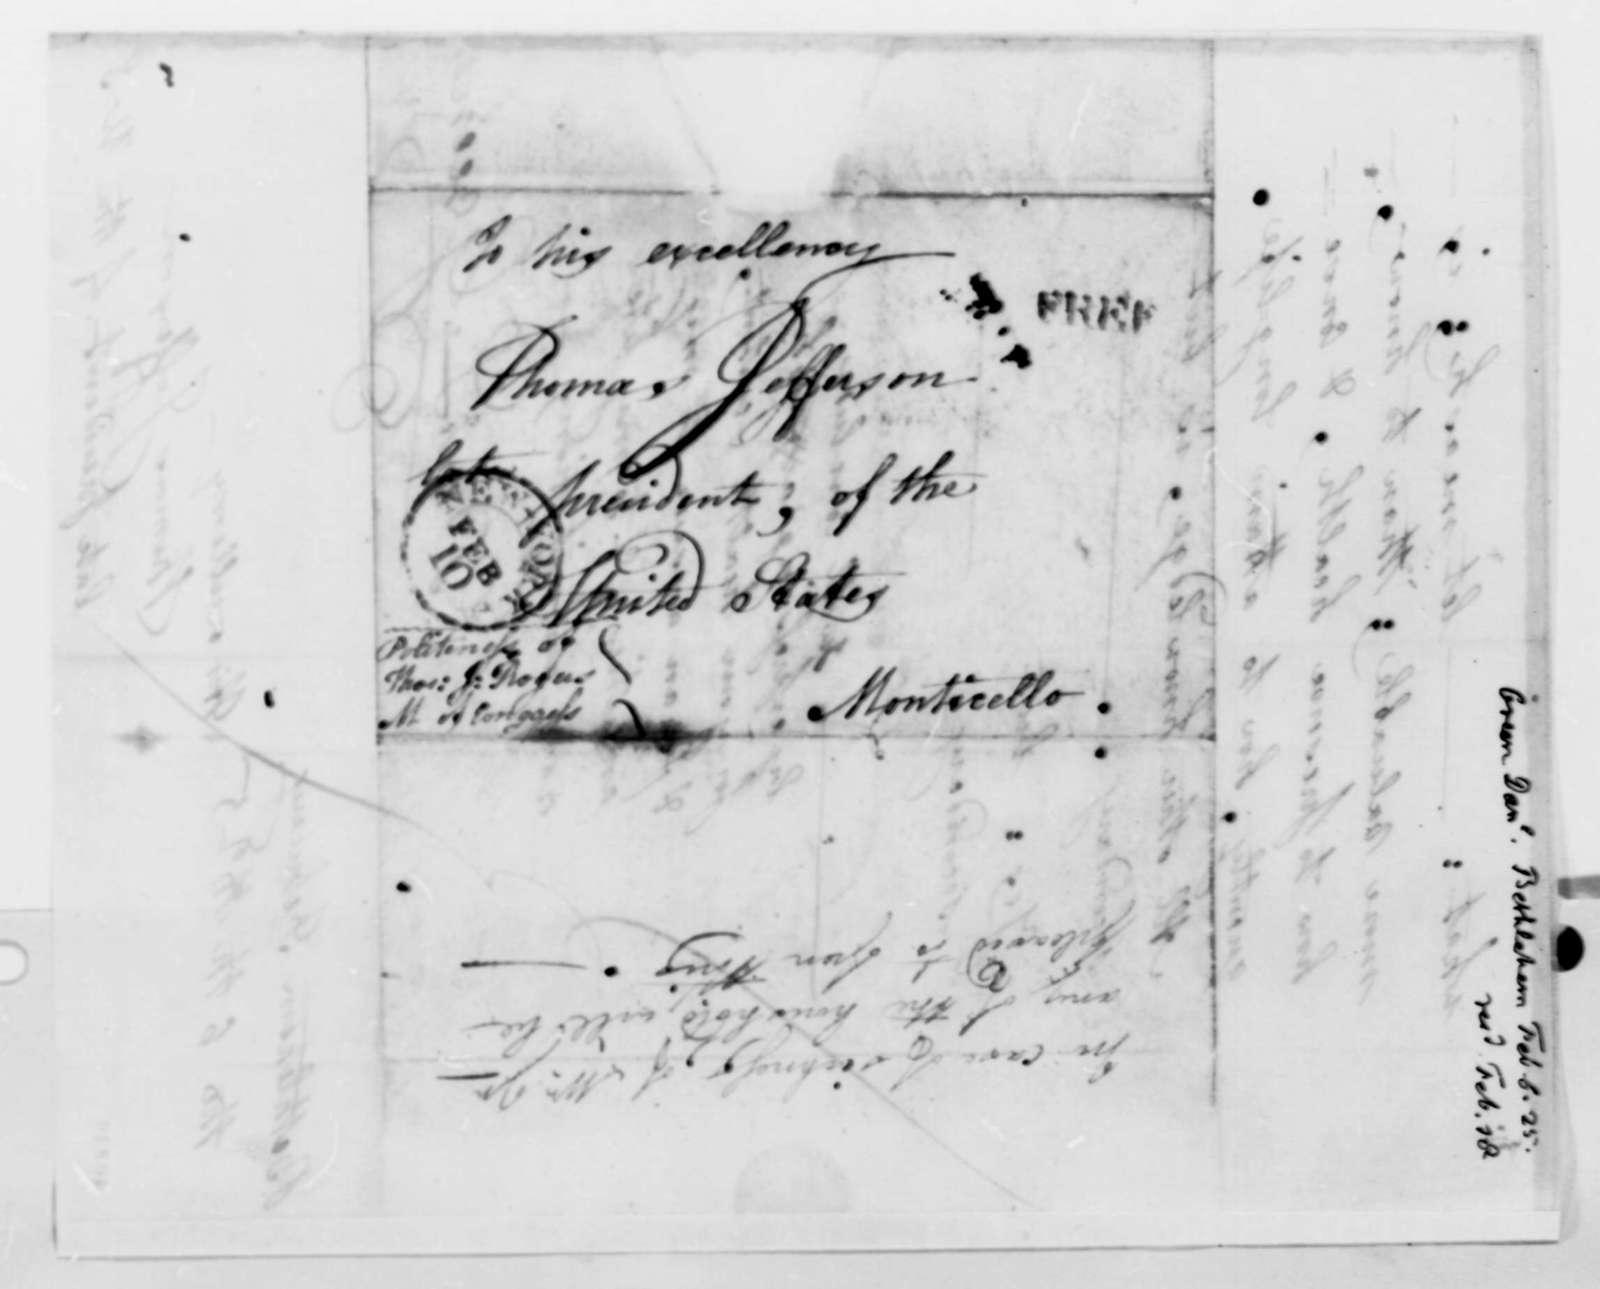 Daniel L. Green to Thomas Jefferson, February 6, 1825